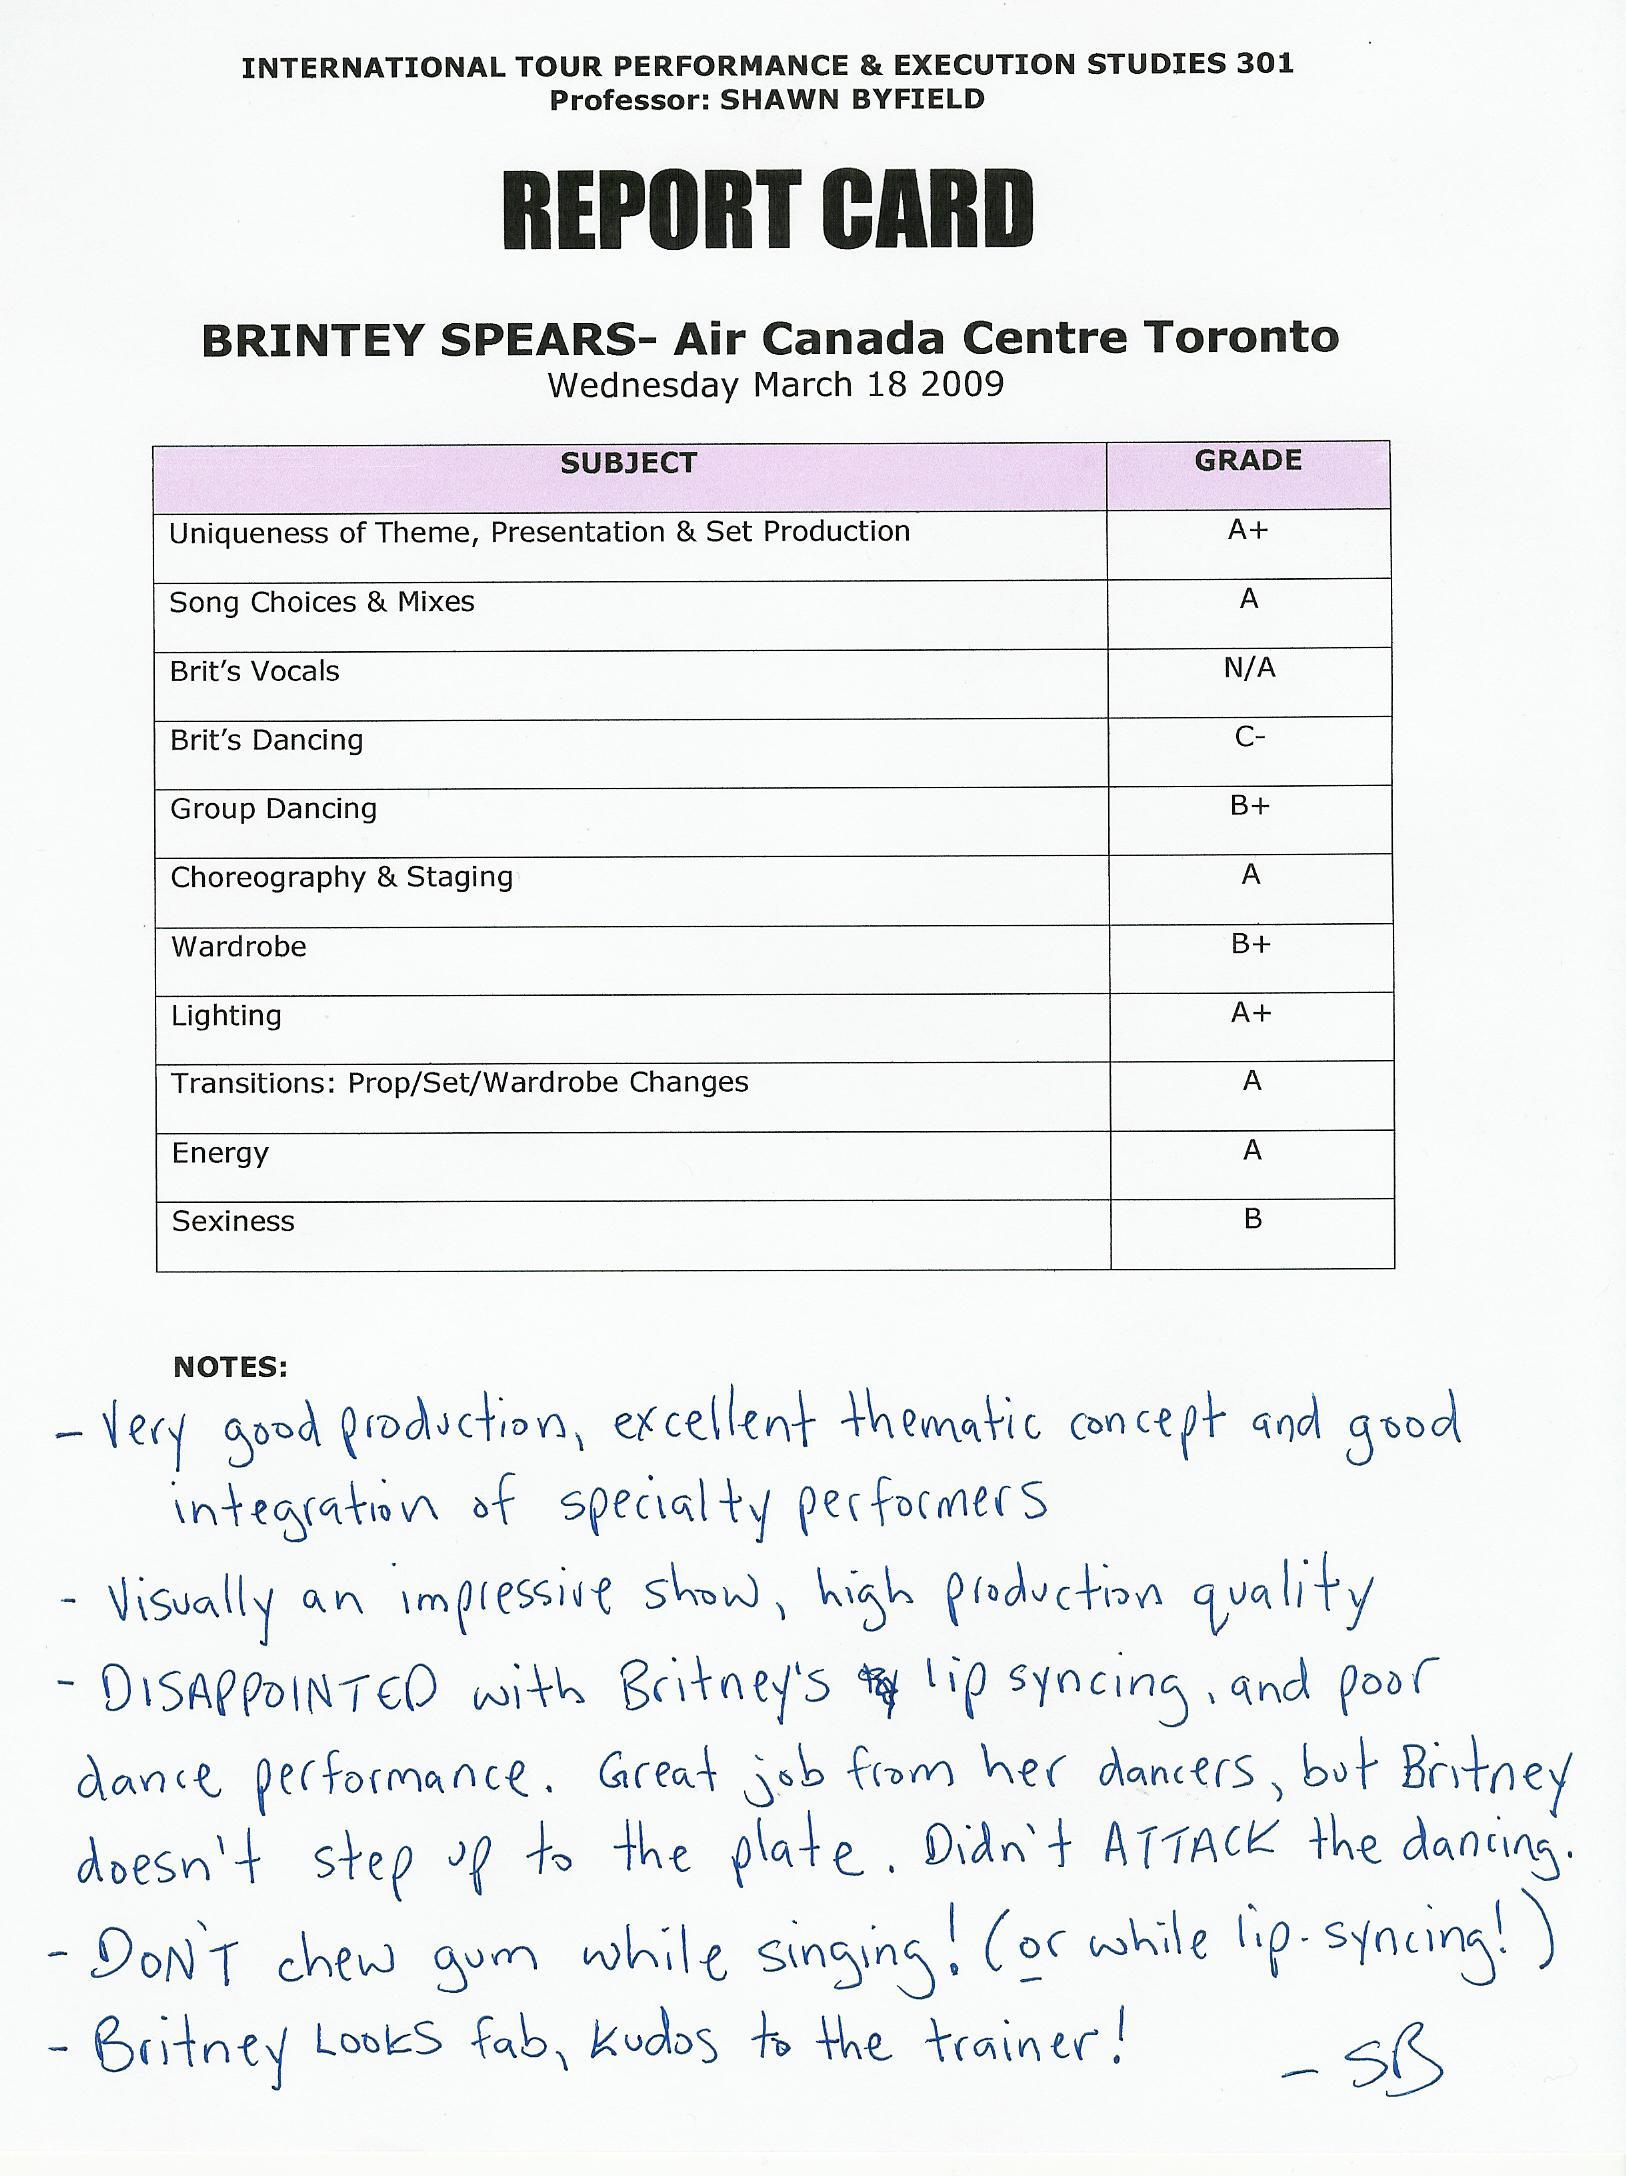 Britney Spears Toronto Report Card